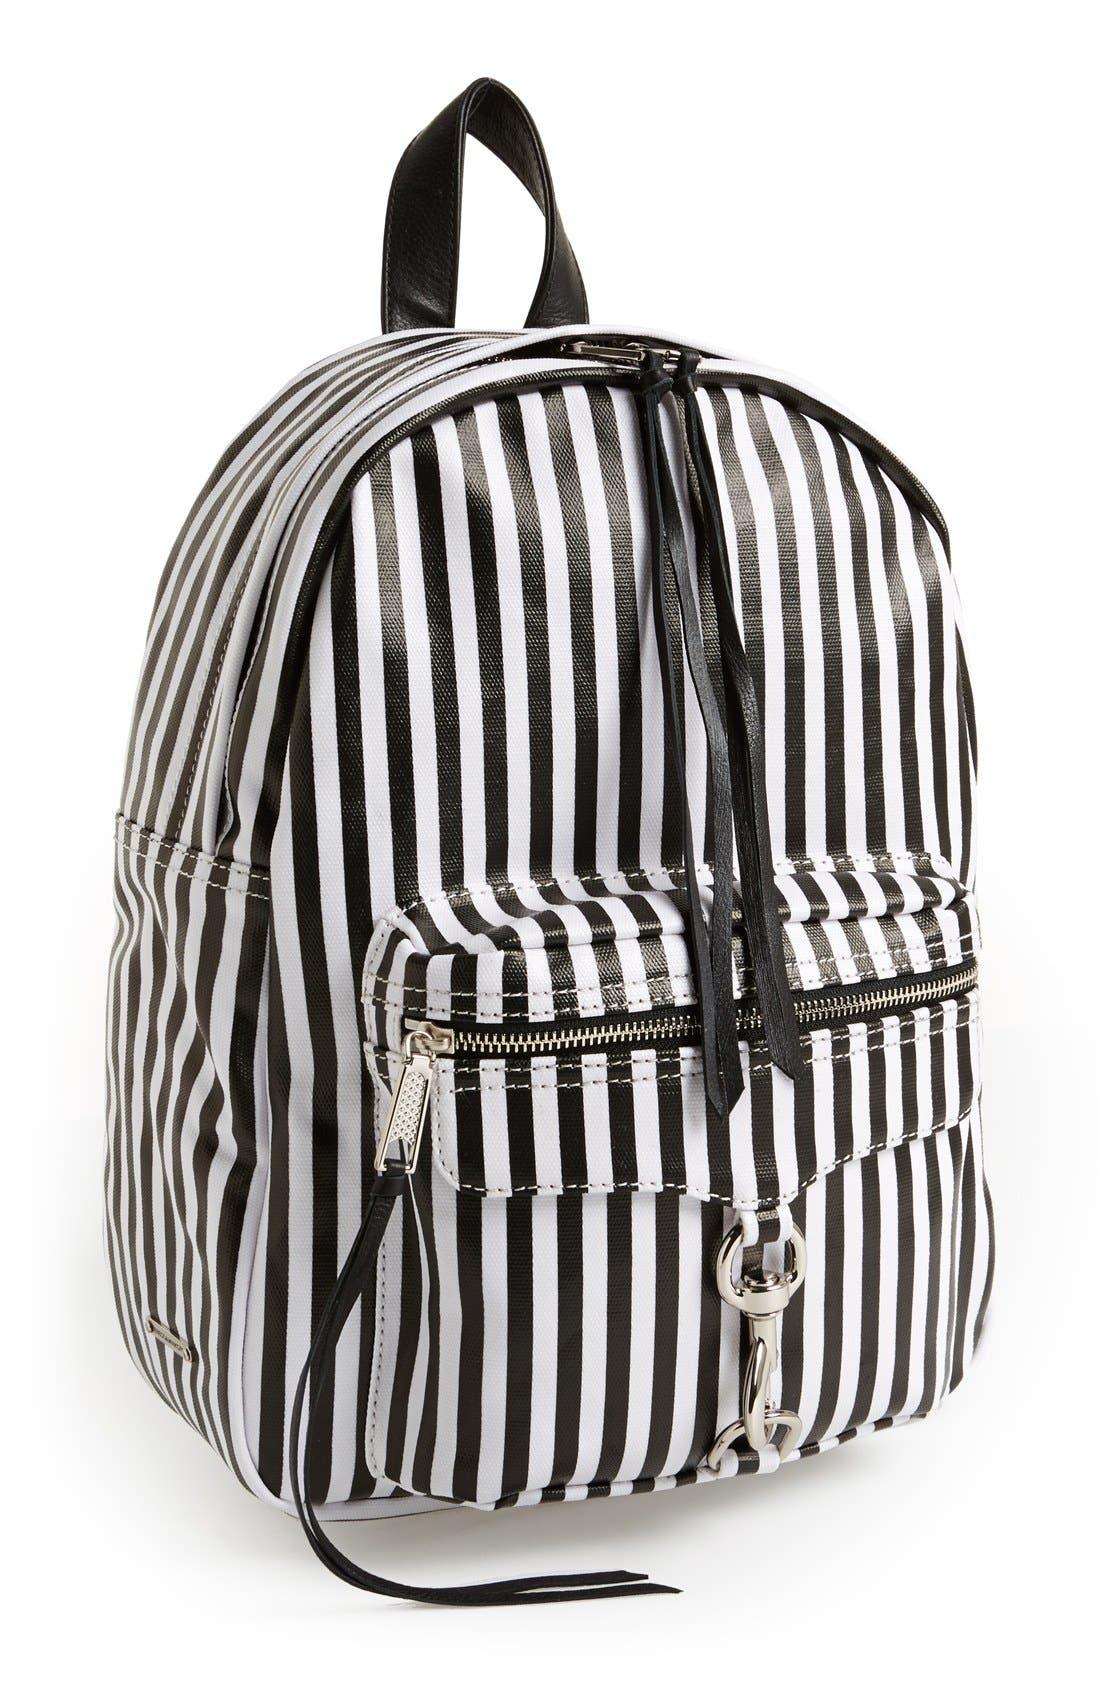 Alternate Image 1 Selected - Rebecca Minkoff 'MAB' Backpack